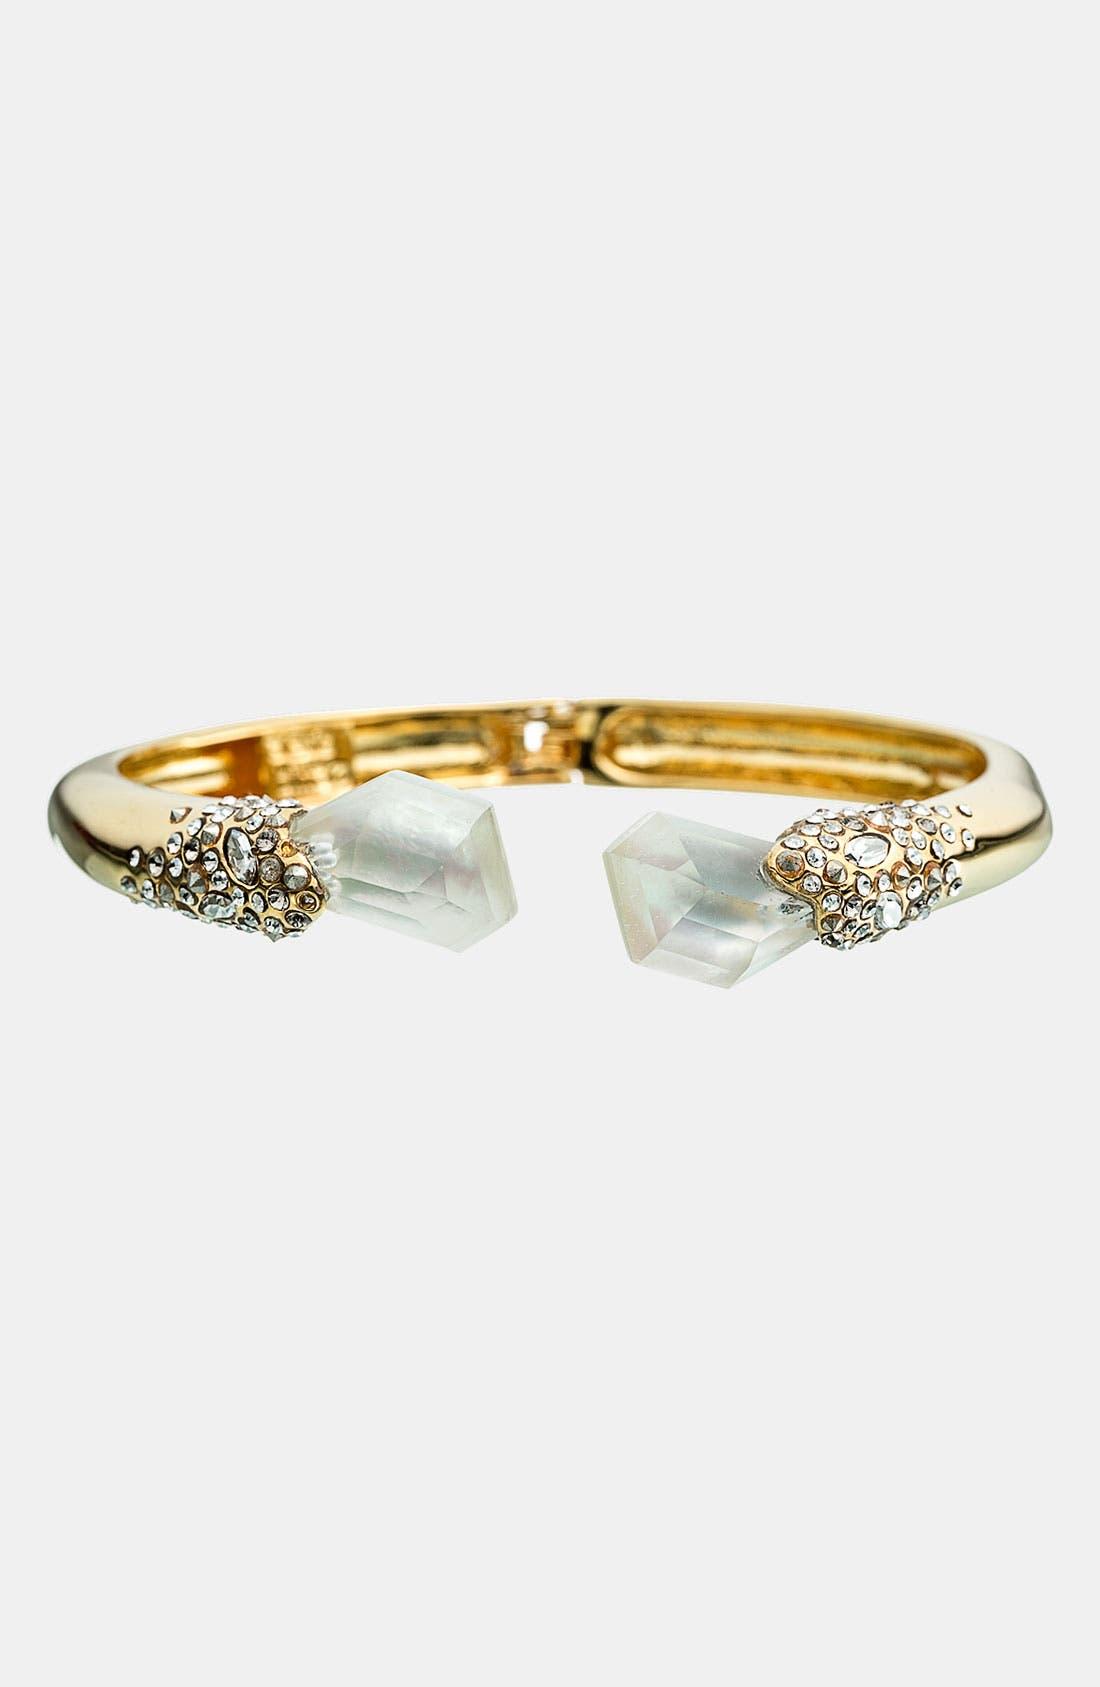 Alternate Image 1 Selected - Alexis Bittar 'Miss Havisham - Bel Air' Stone Cap Cuff Bracelet